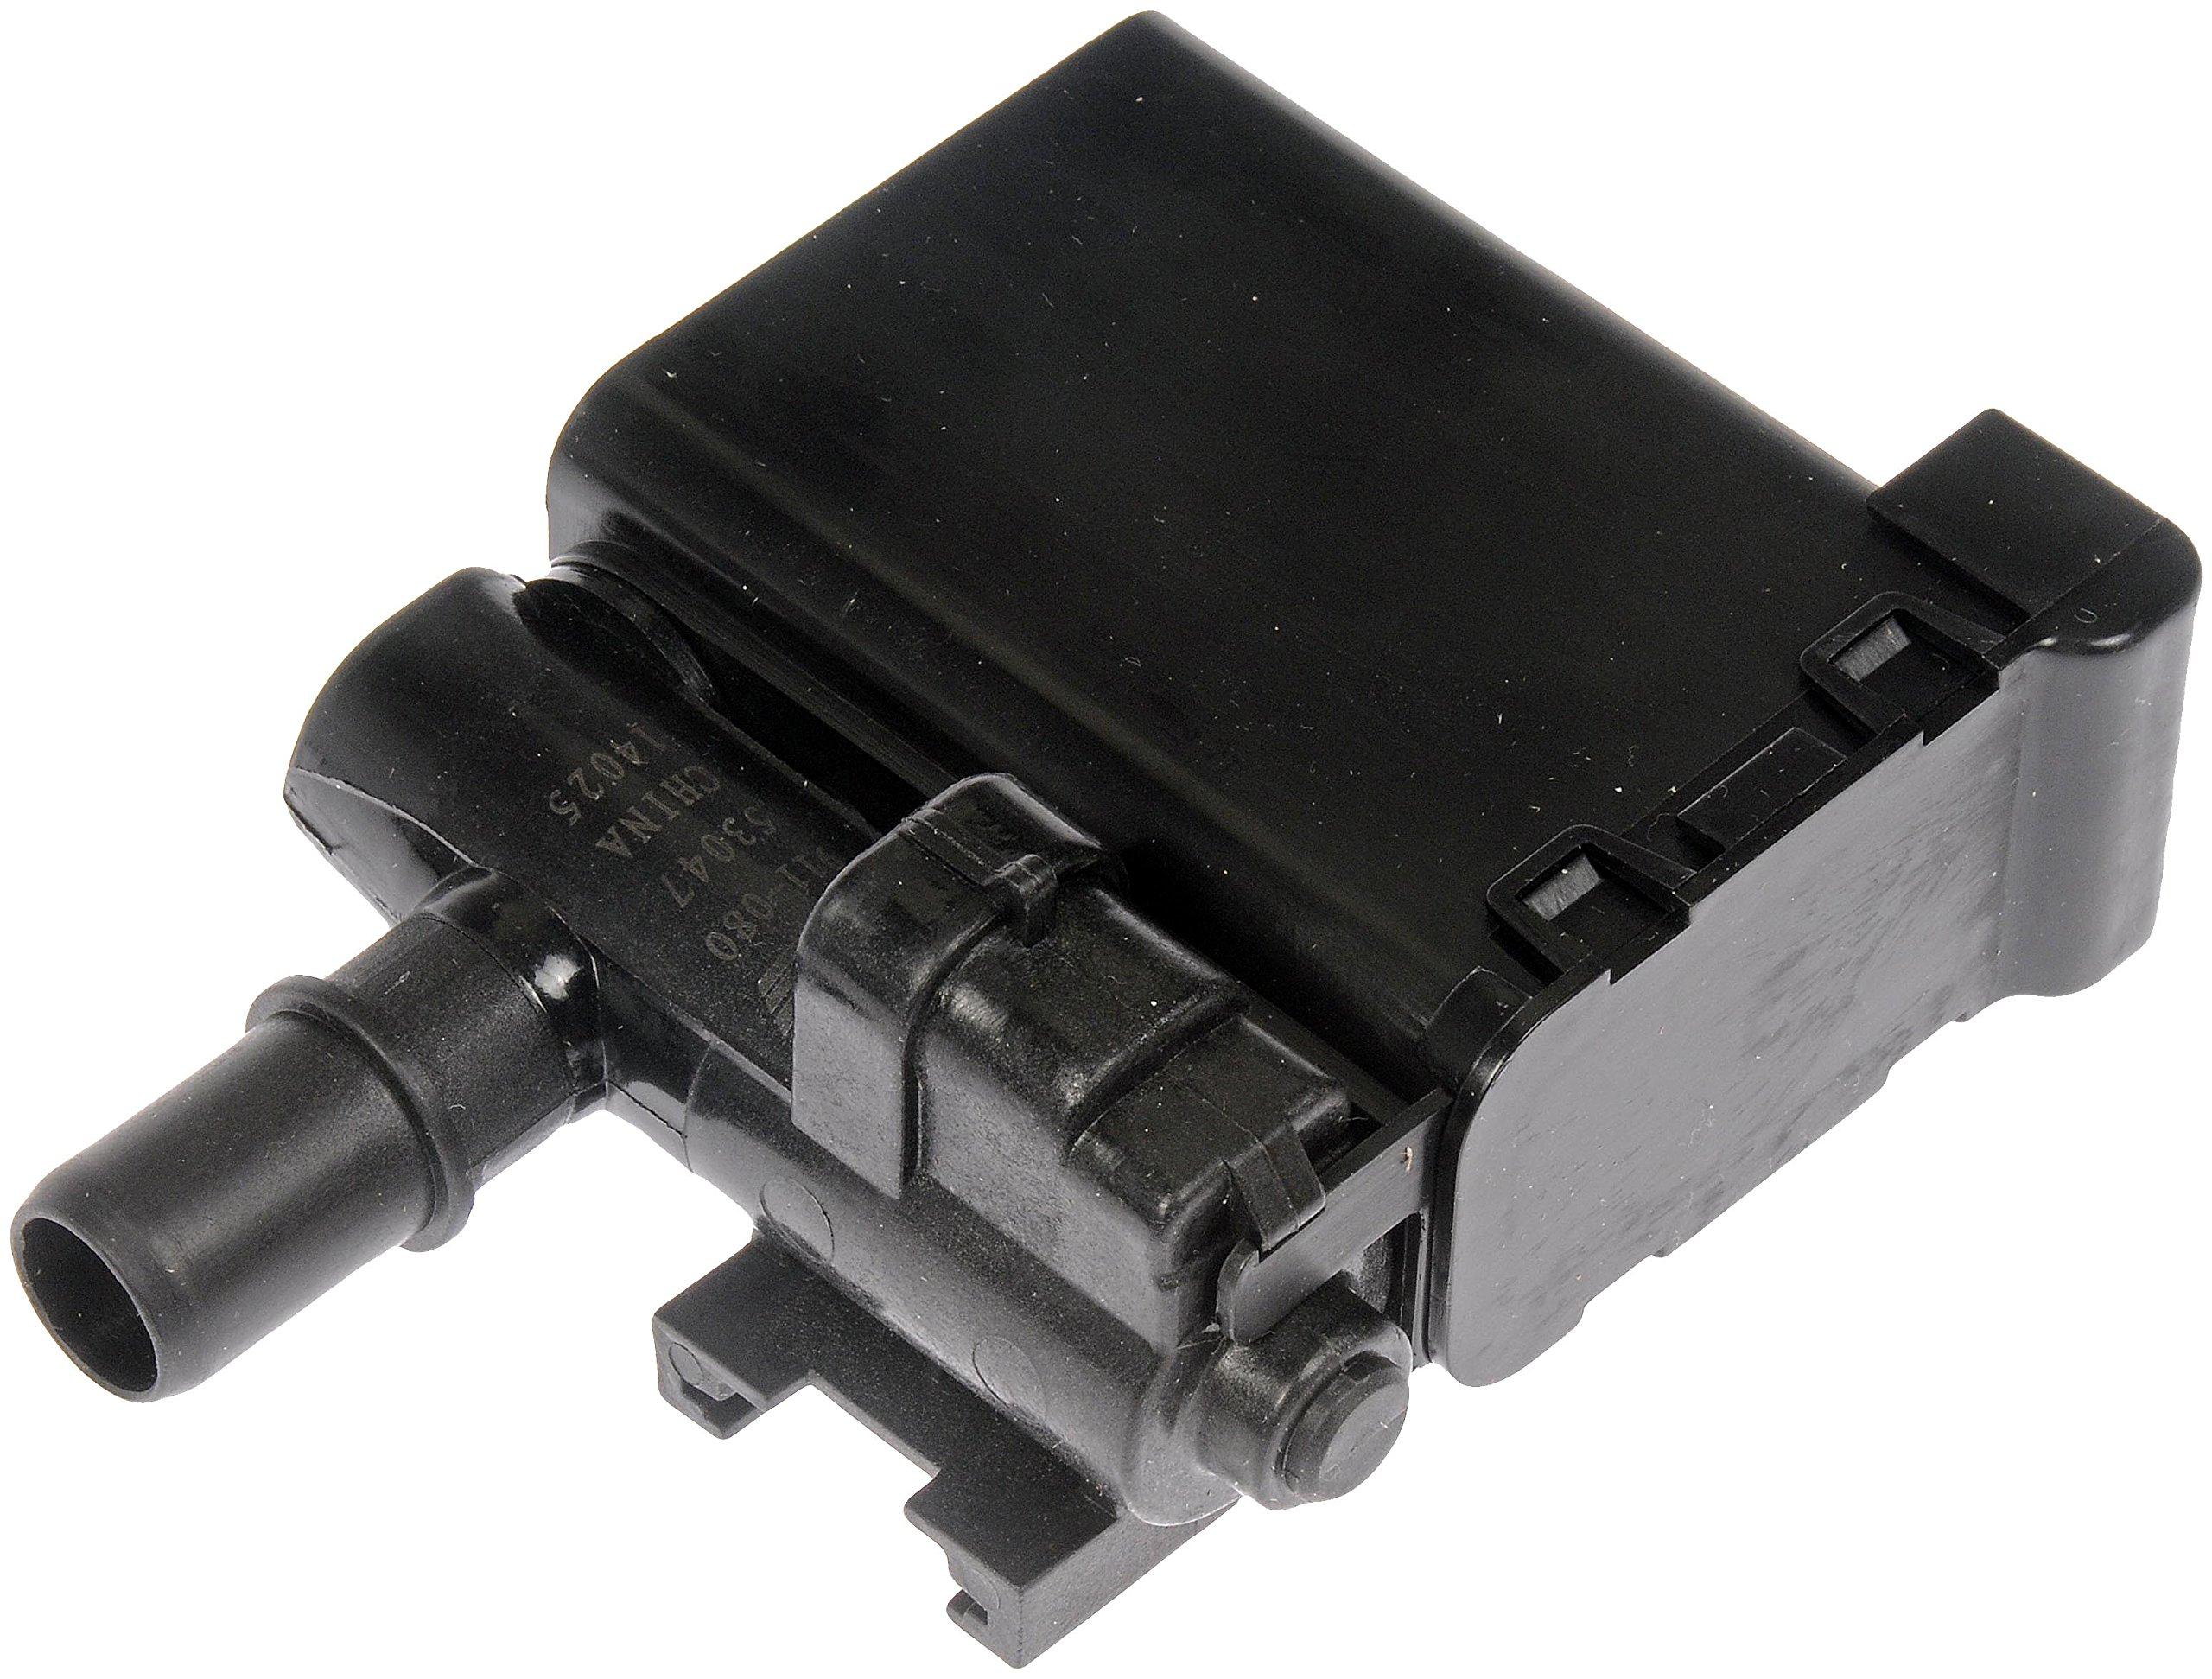 Dorman 911-080 Evaporative Canister Vent Valve